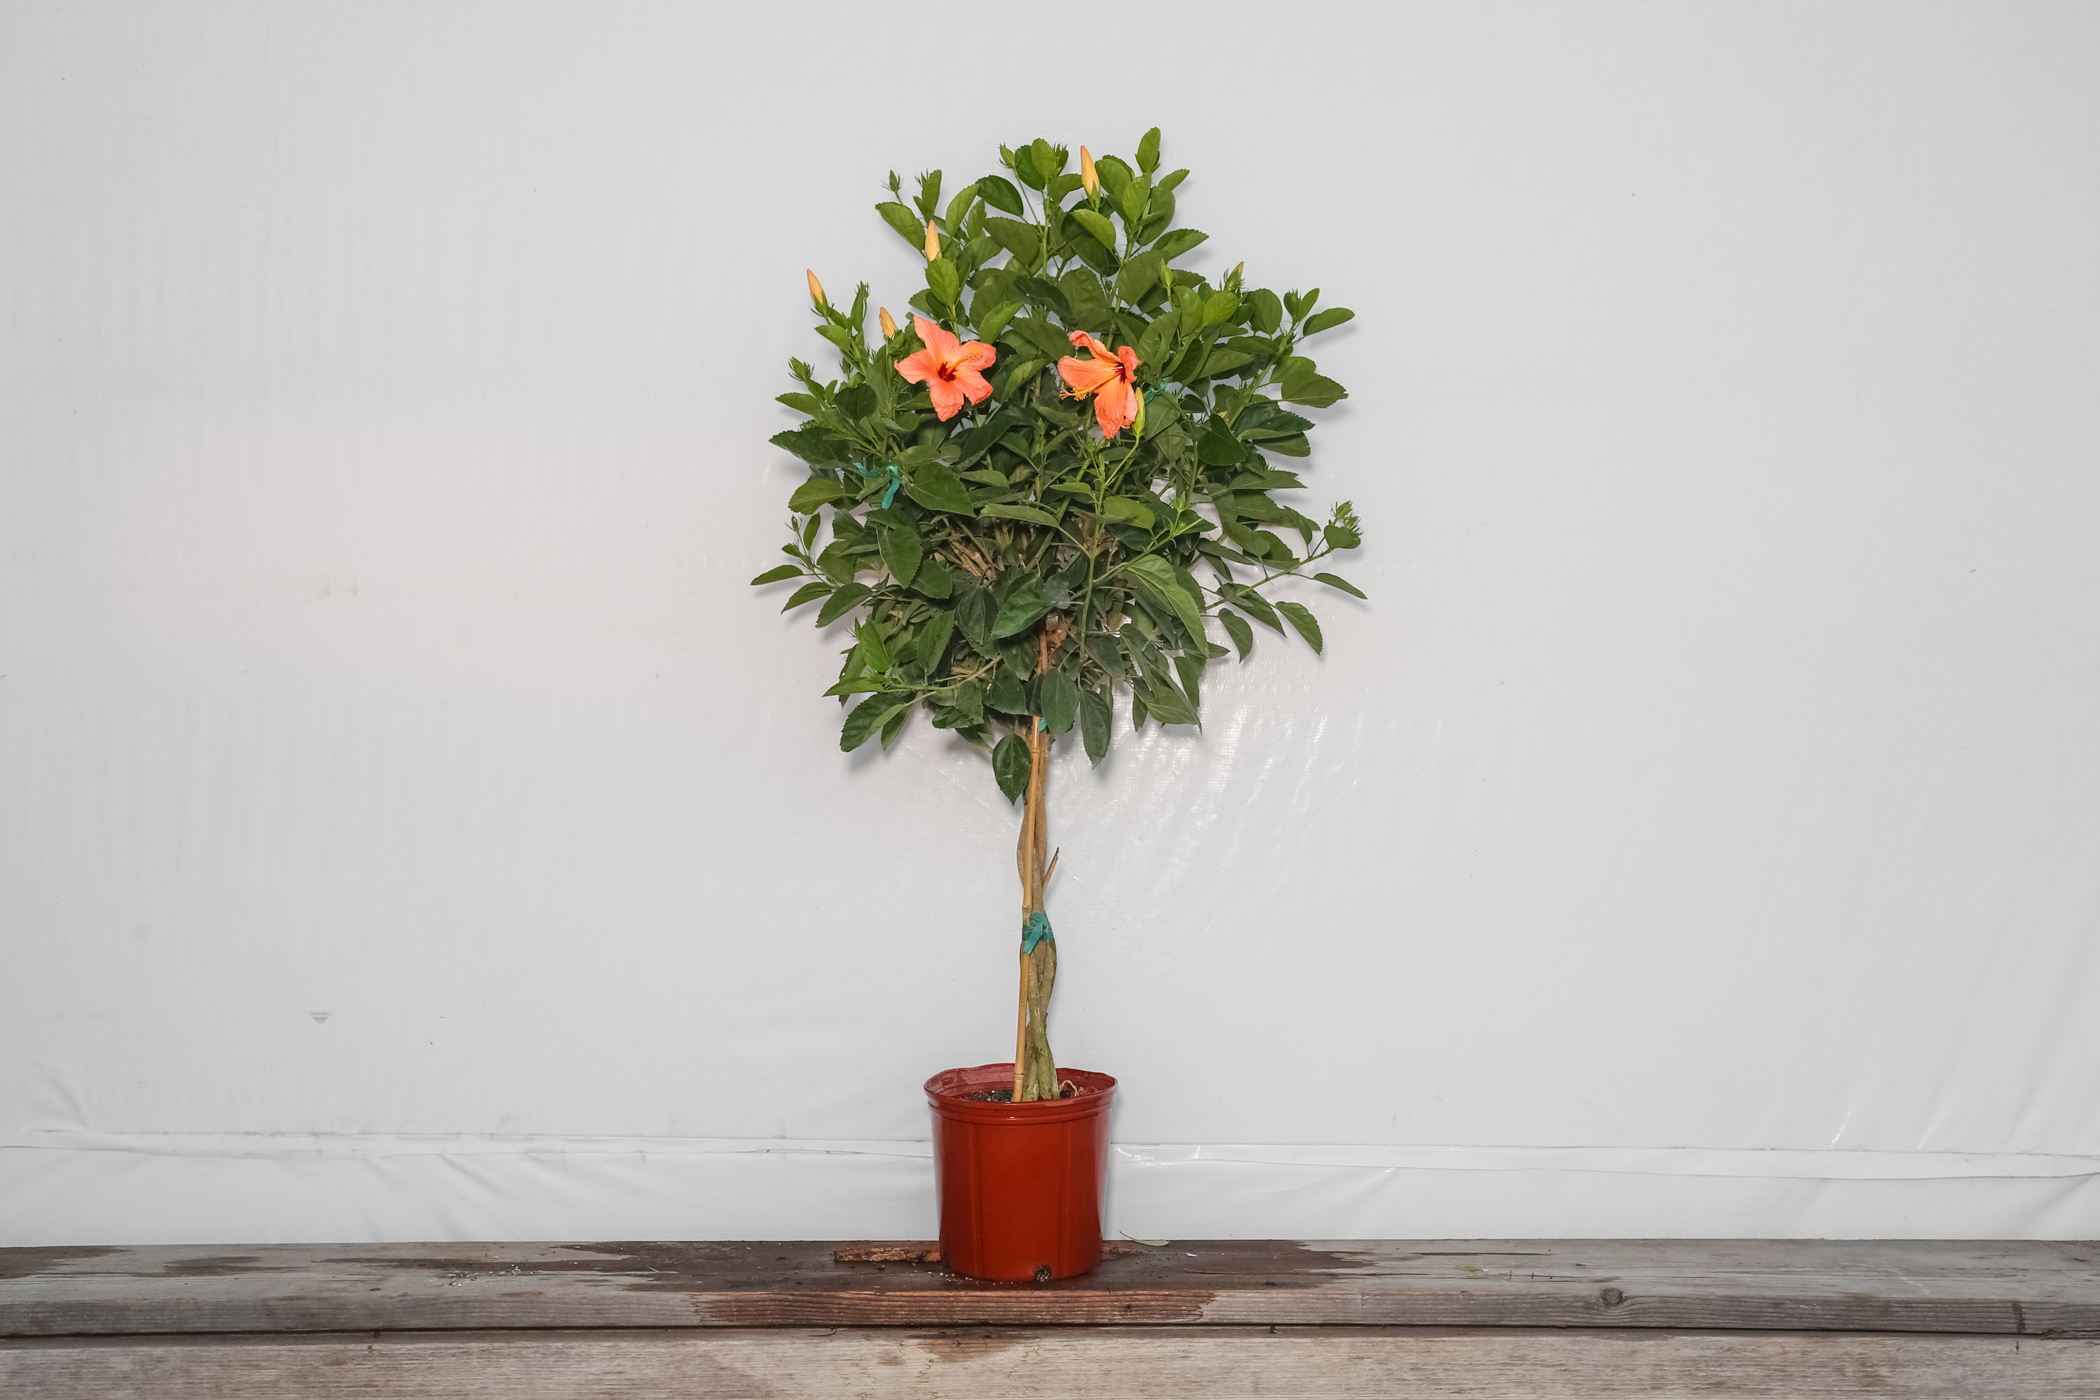 Braided Hibiscus Tree Peach Single 3 Gallon